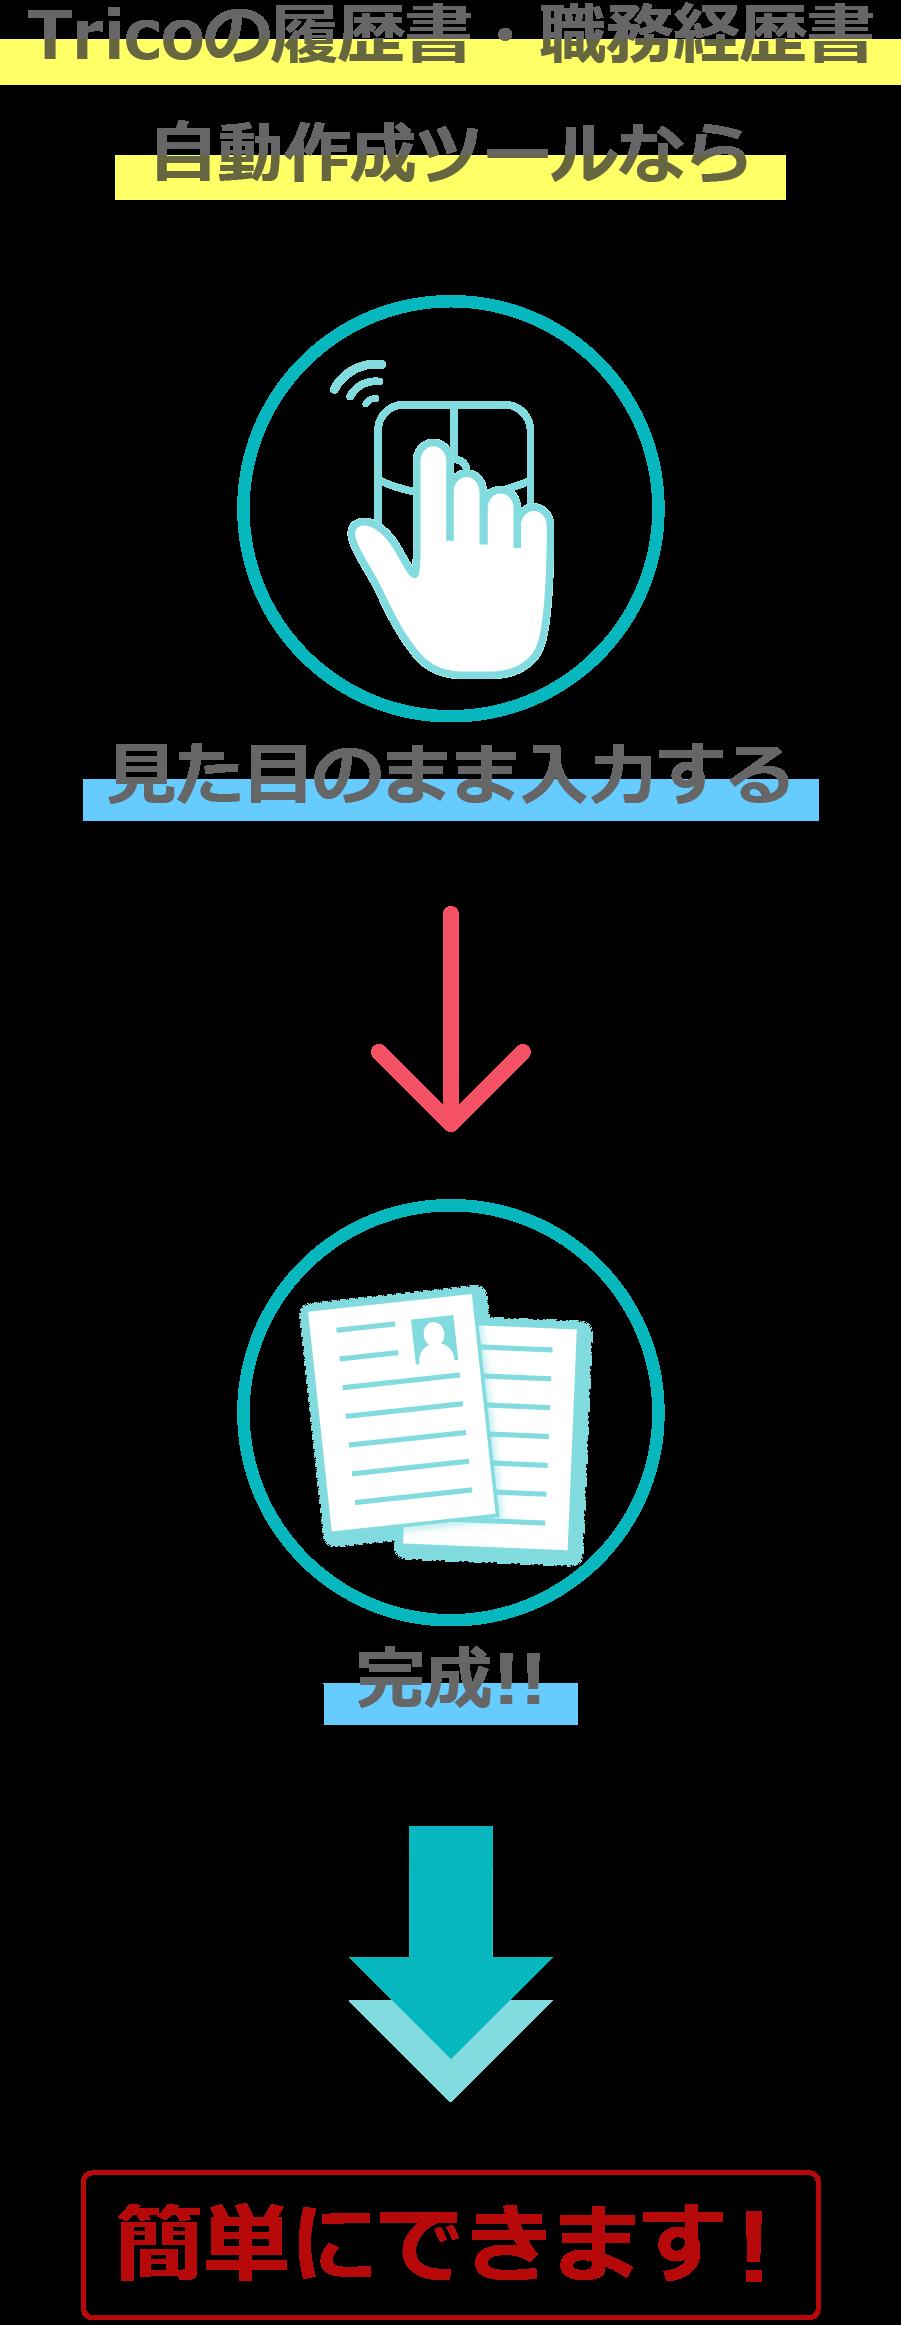 Tricoの履歴書・職務経歴書自動作成ツールなら見た目のまま入力するだけで完了!